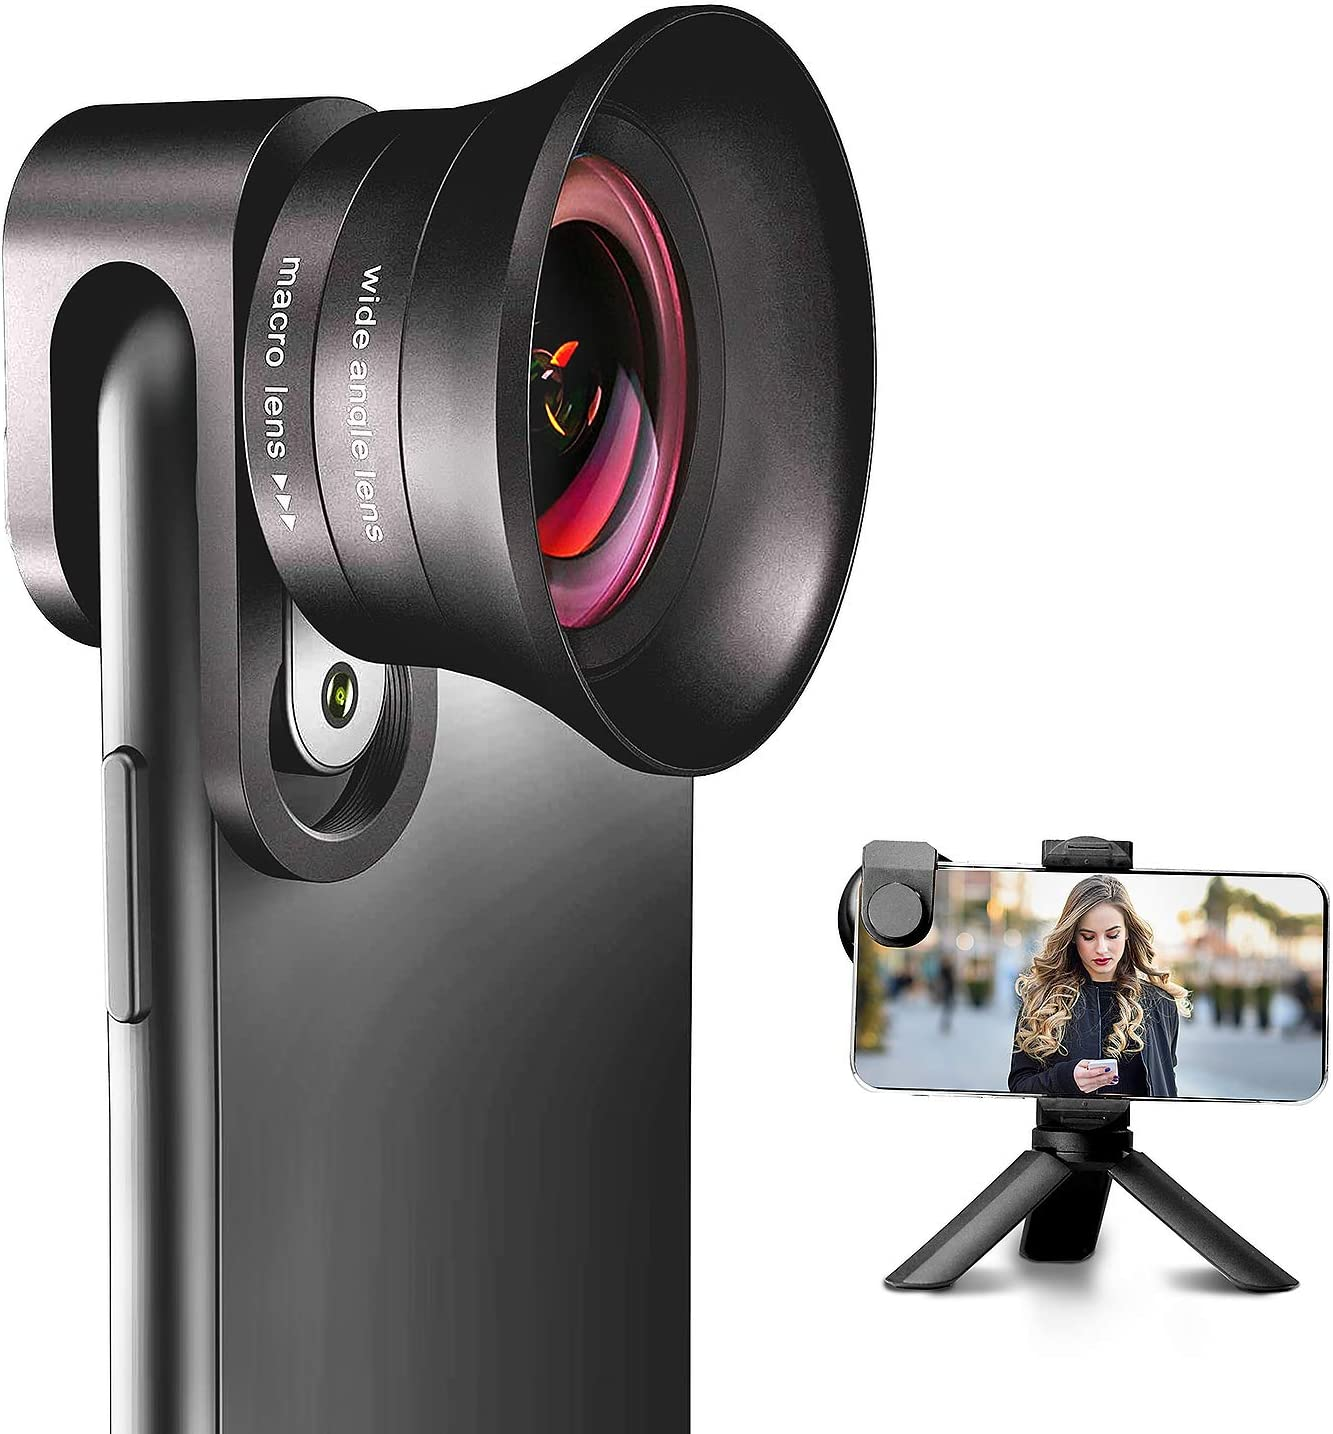 Handy Kameraobjektiv Pro Mit Stativ Angfly 4k Hd Kamera